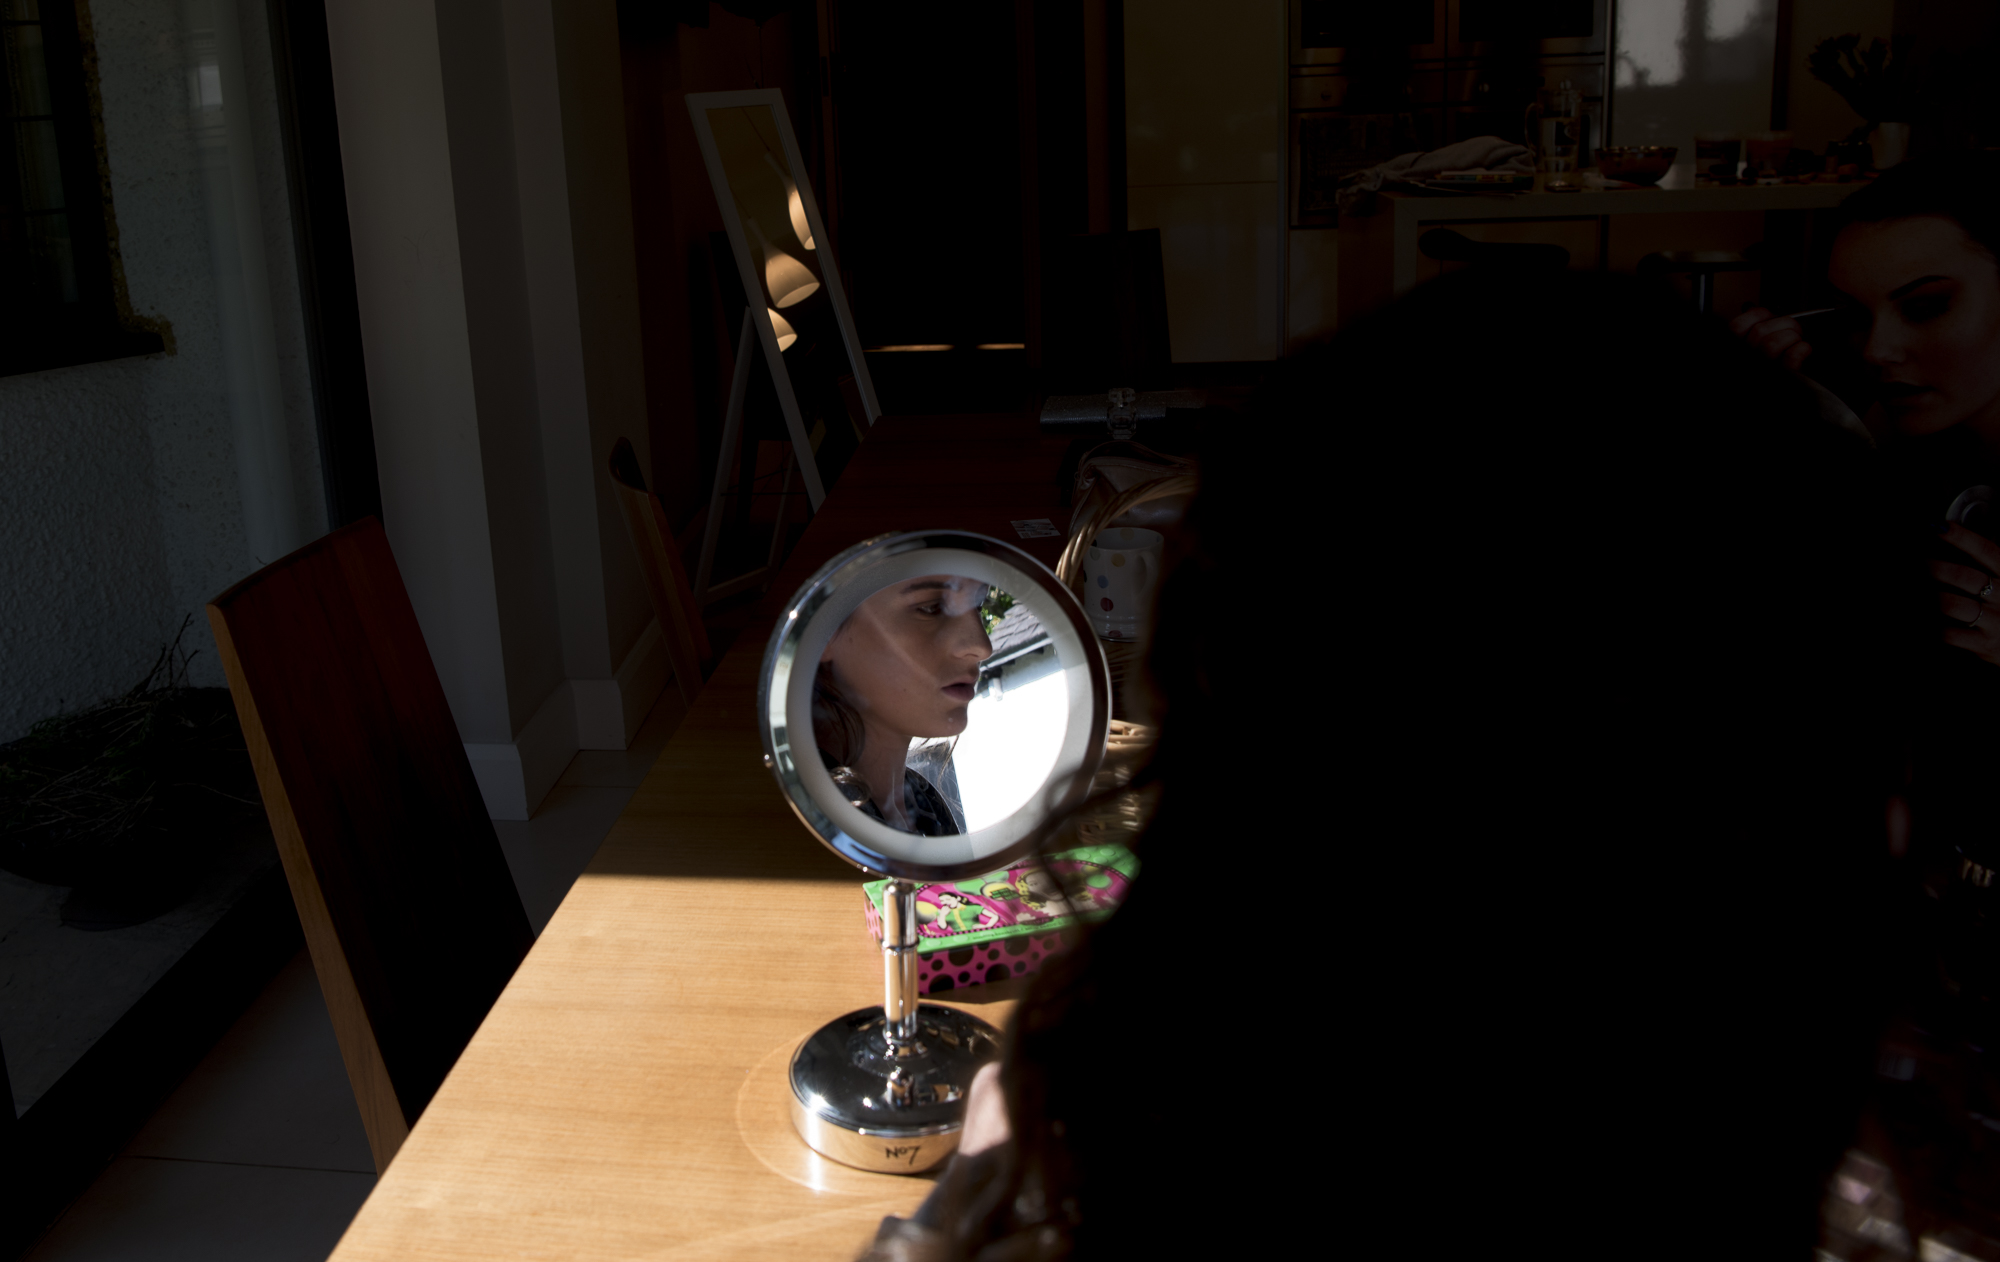 sally-hornung-photpgraphy-girl-mirror-2.jpg